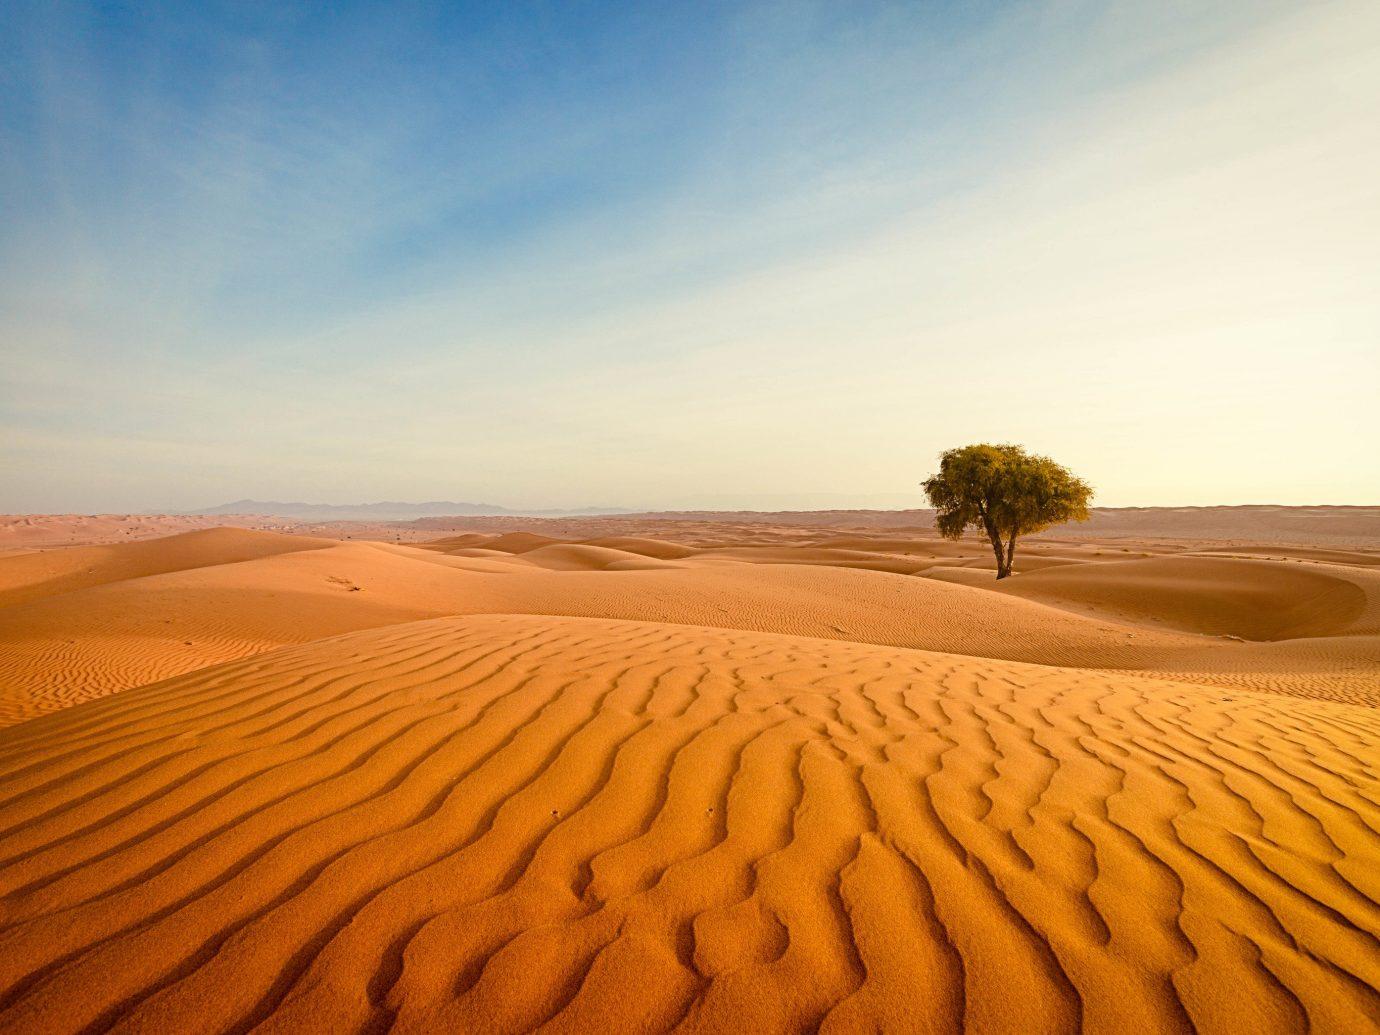 Adventure Off-the-beaten Path Trip Ideas Desert erg aeolian landform sky sahara singing sand sand landscape dune morning ecoregion horizon sunlight wadi plain